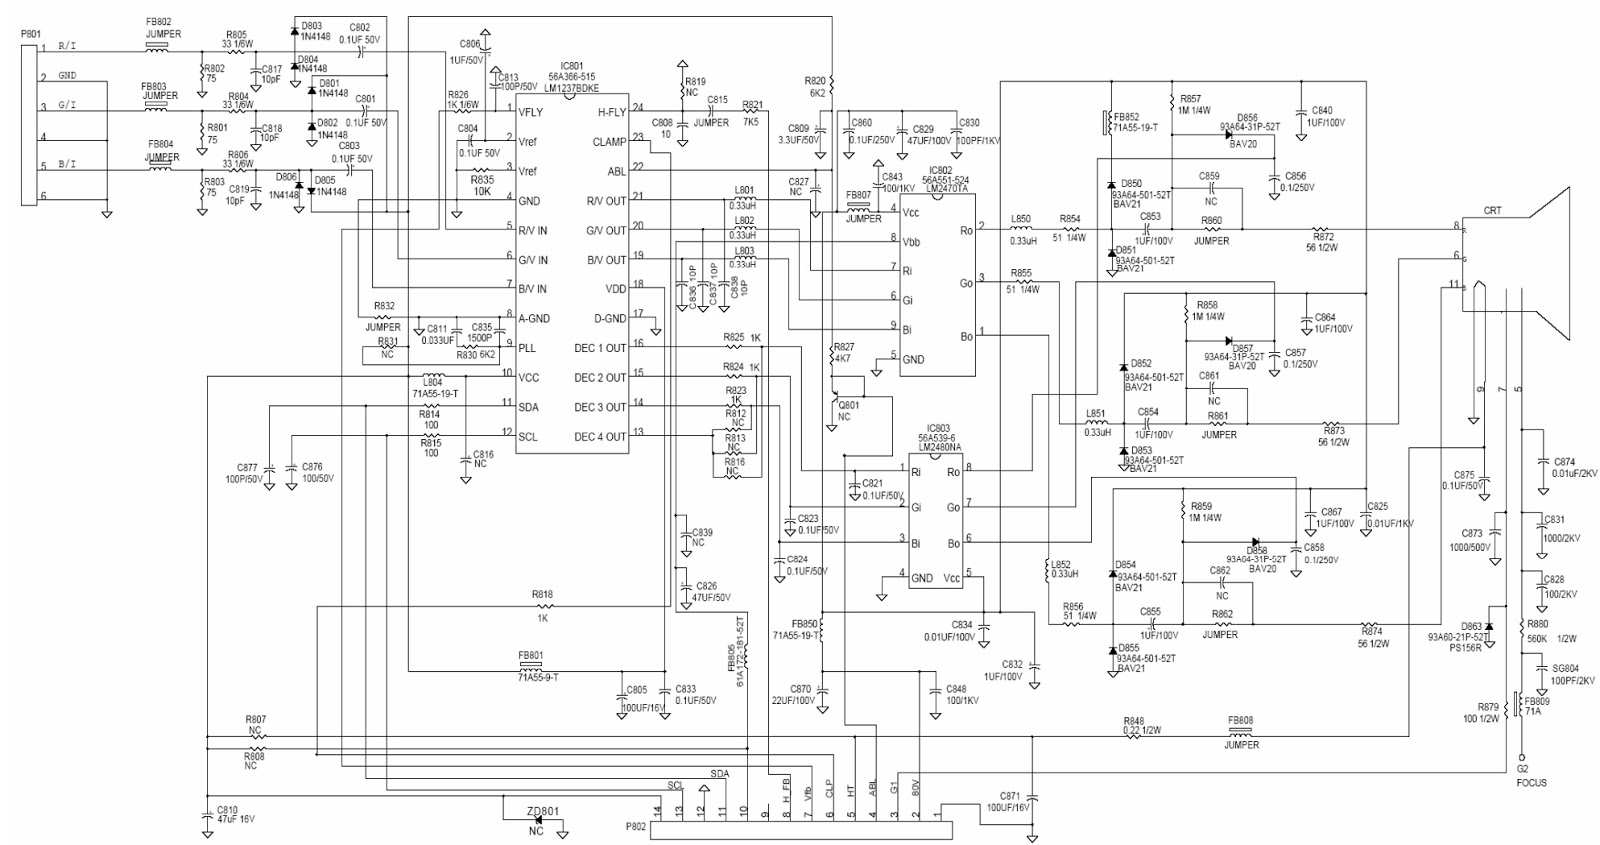 small resolution of crt screen schematic wiring diagram crt monitor schematic diagram schema wiring diagramhp 7540 17 inch crt